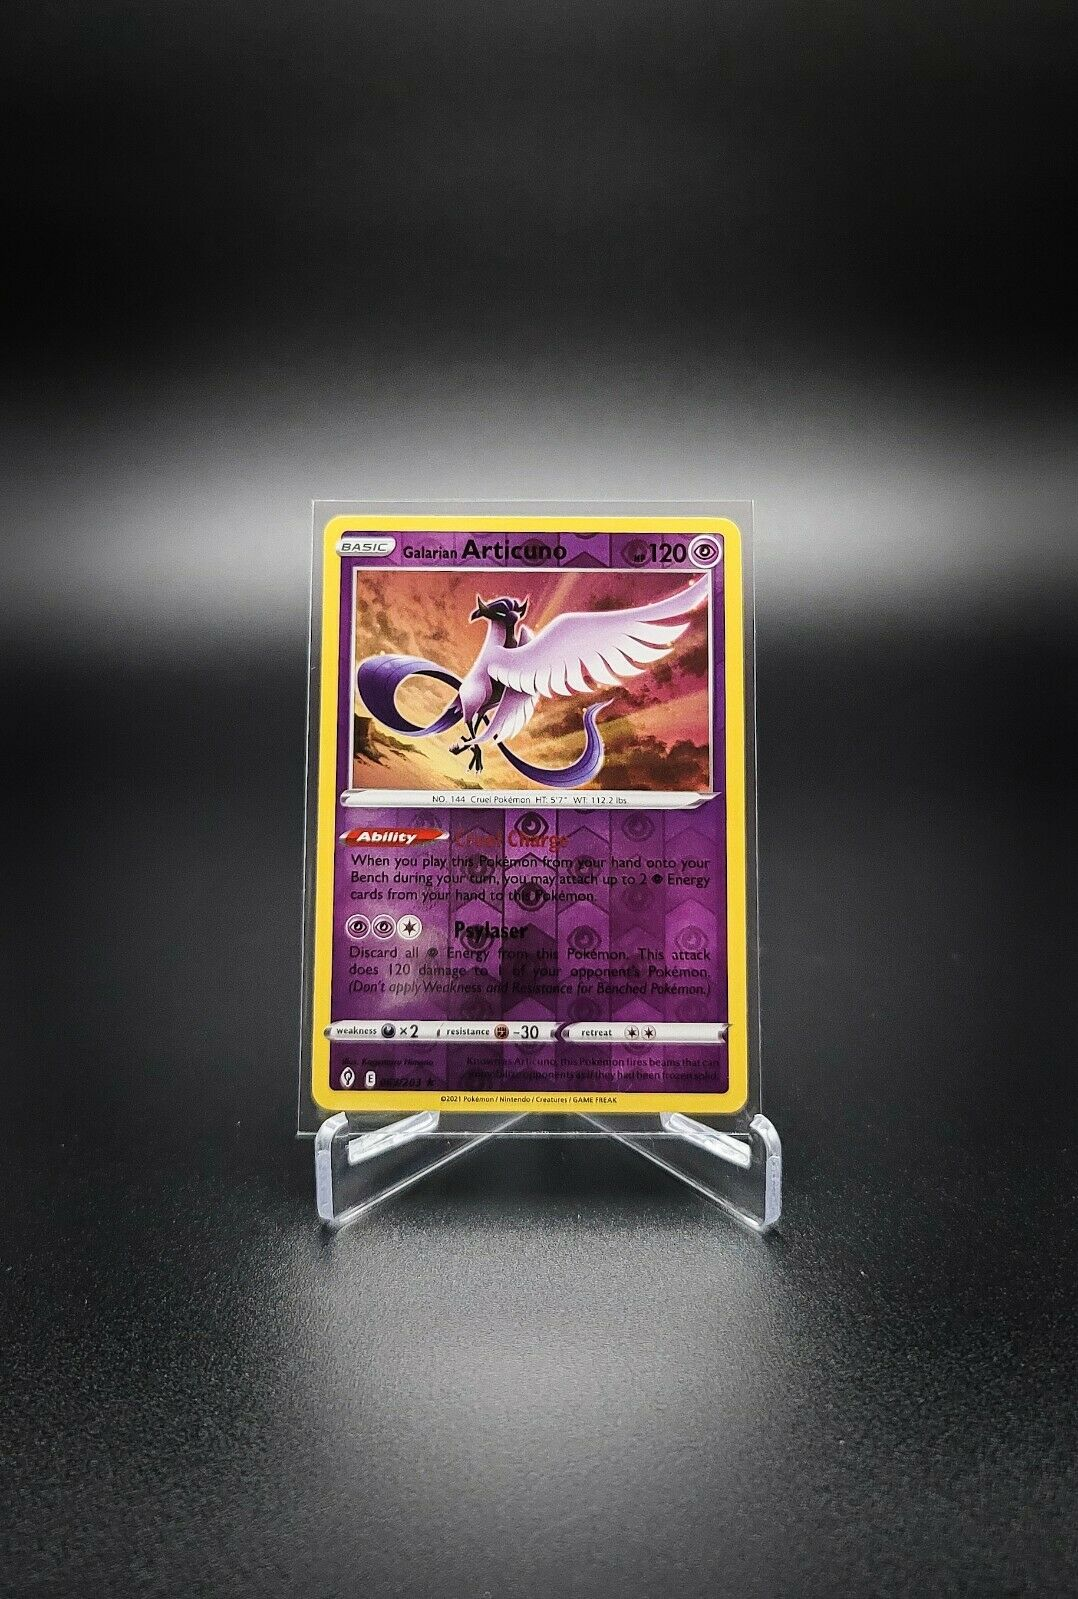 Pokemon - Galarian Articuno - Evolving Skies - 063/203 - reverse holo